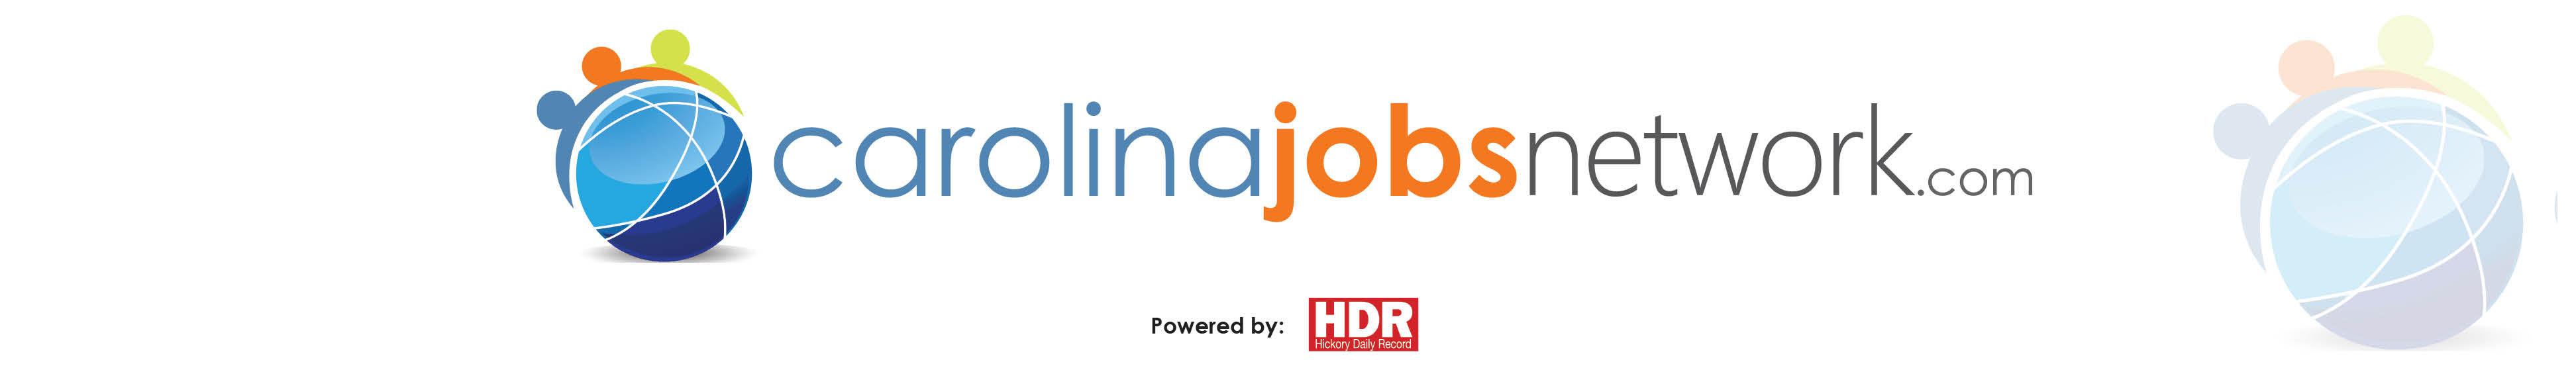 jobs claremont nc